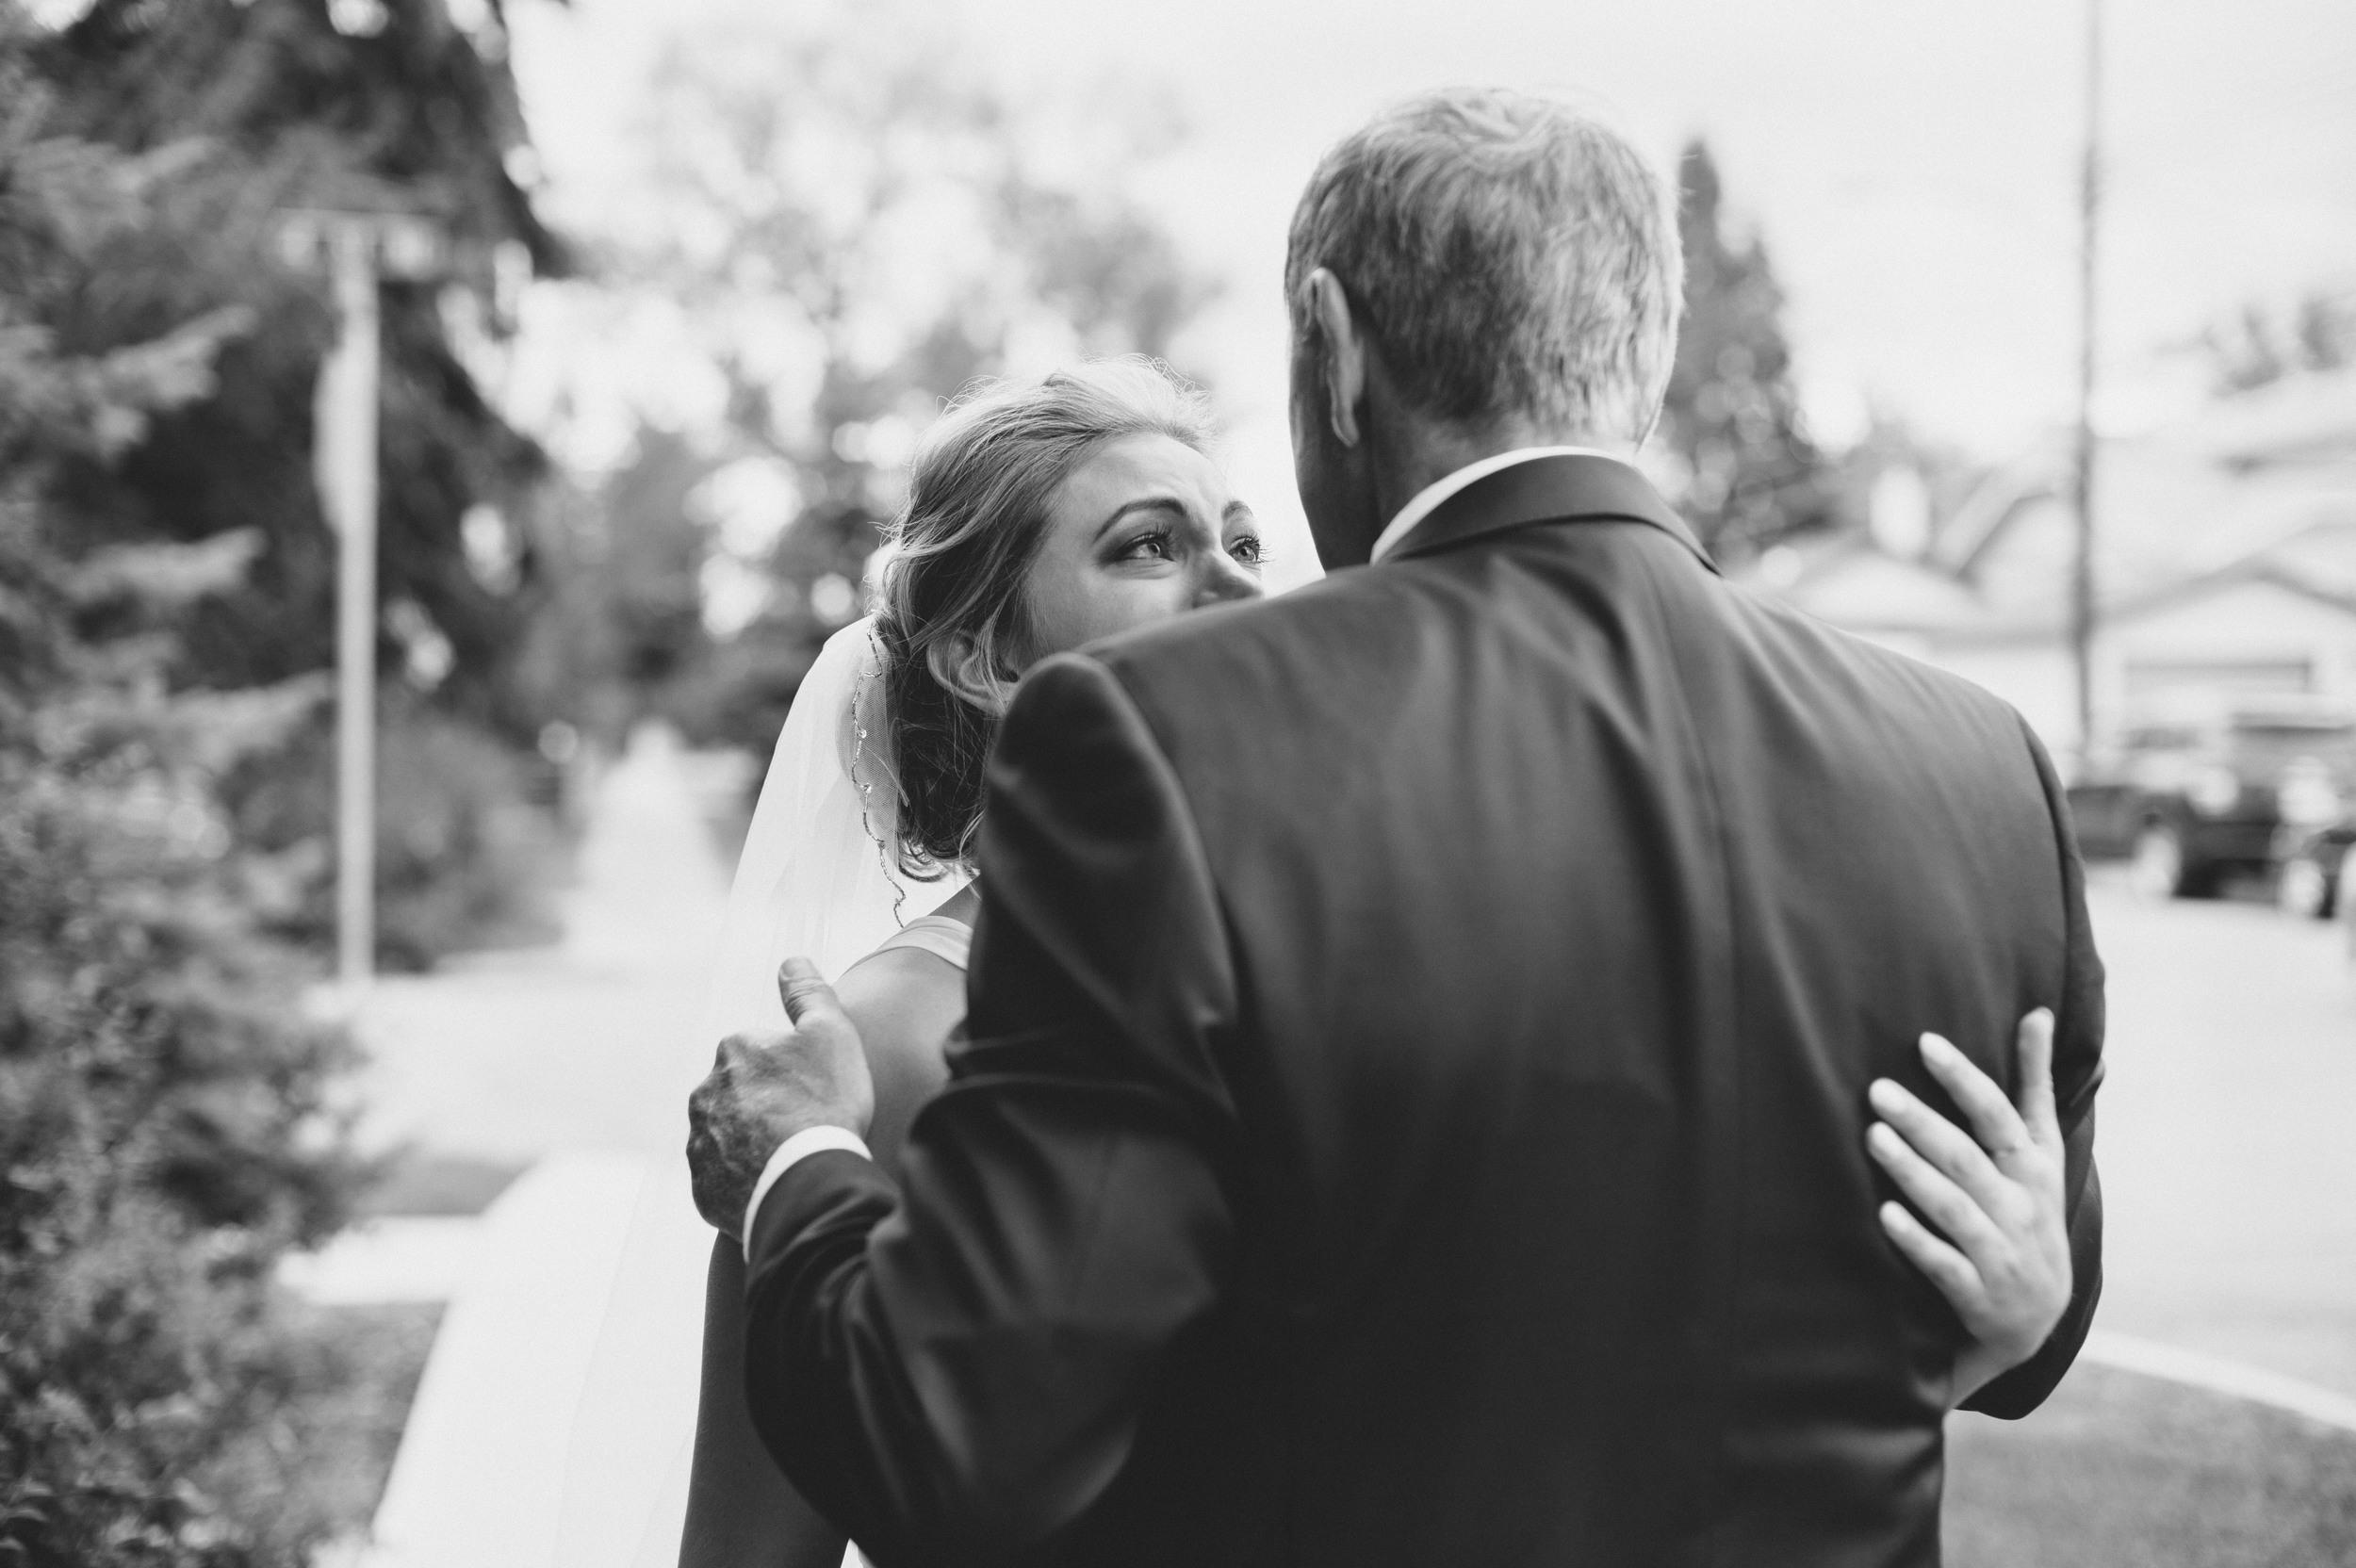 Vancouevr wedding photography edward lai photogrpaher -6.jpg